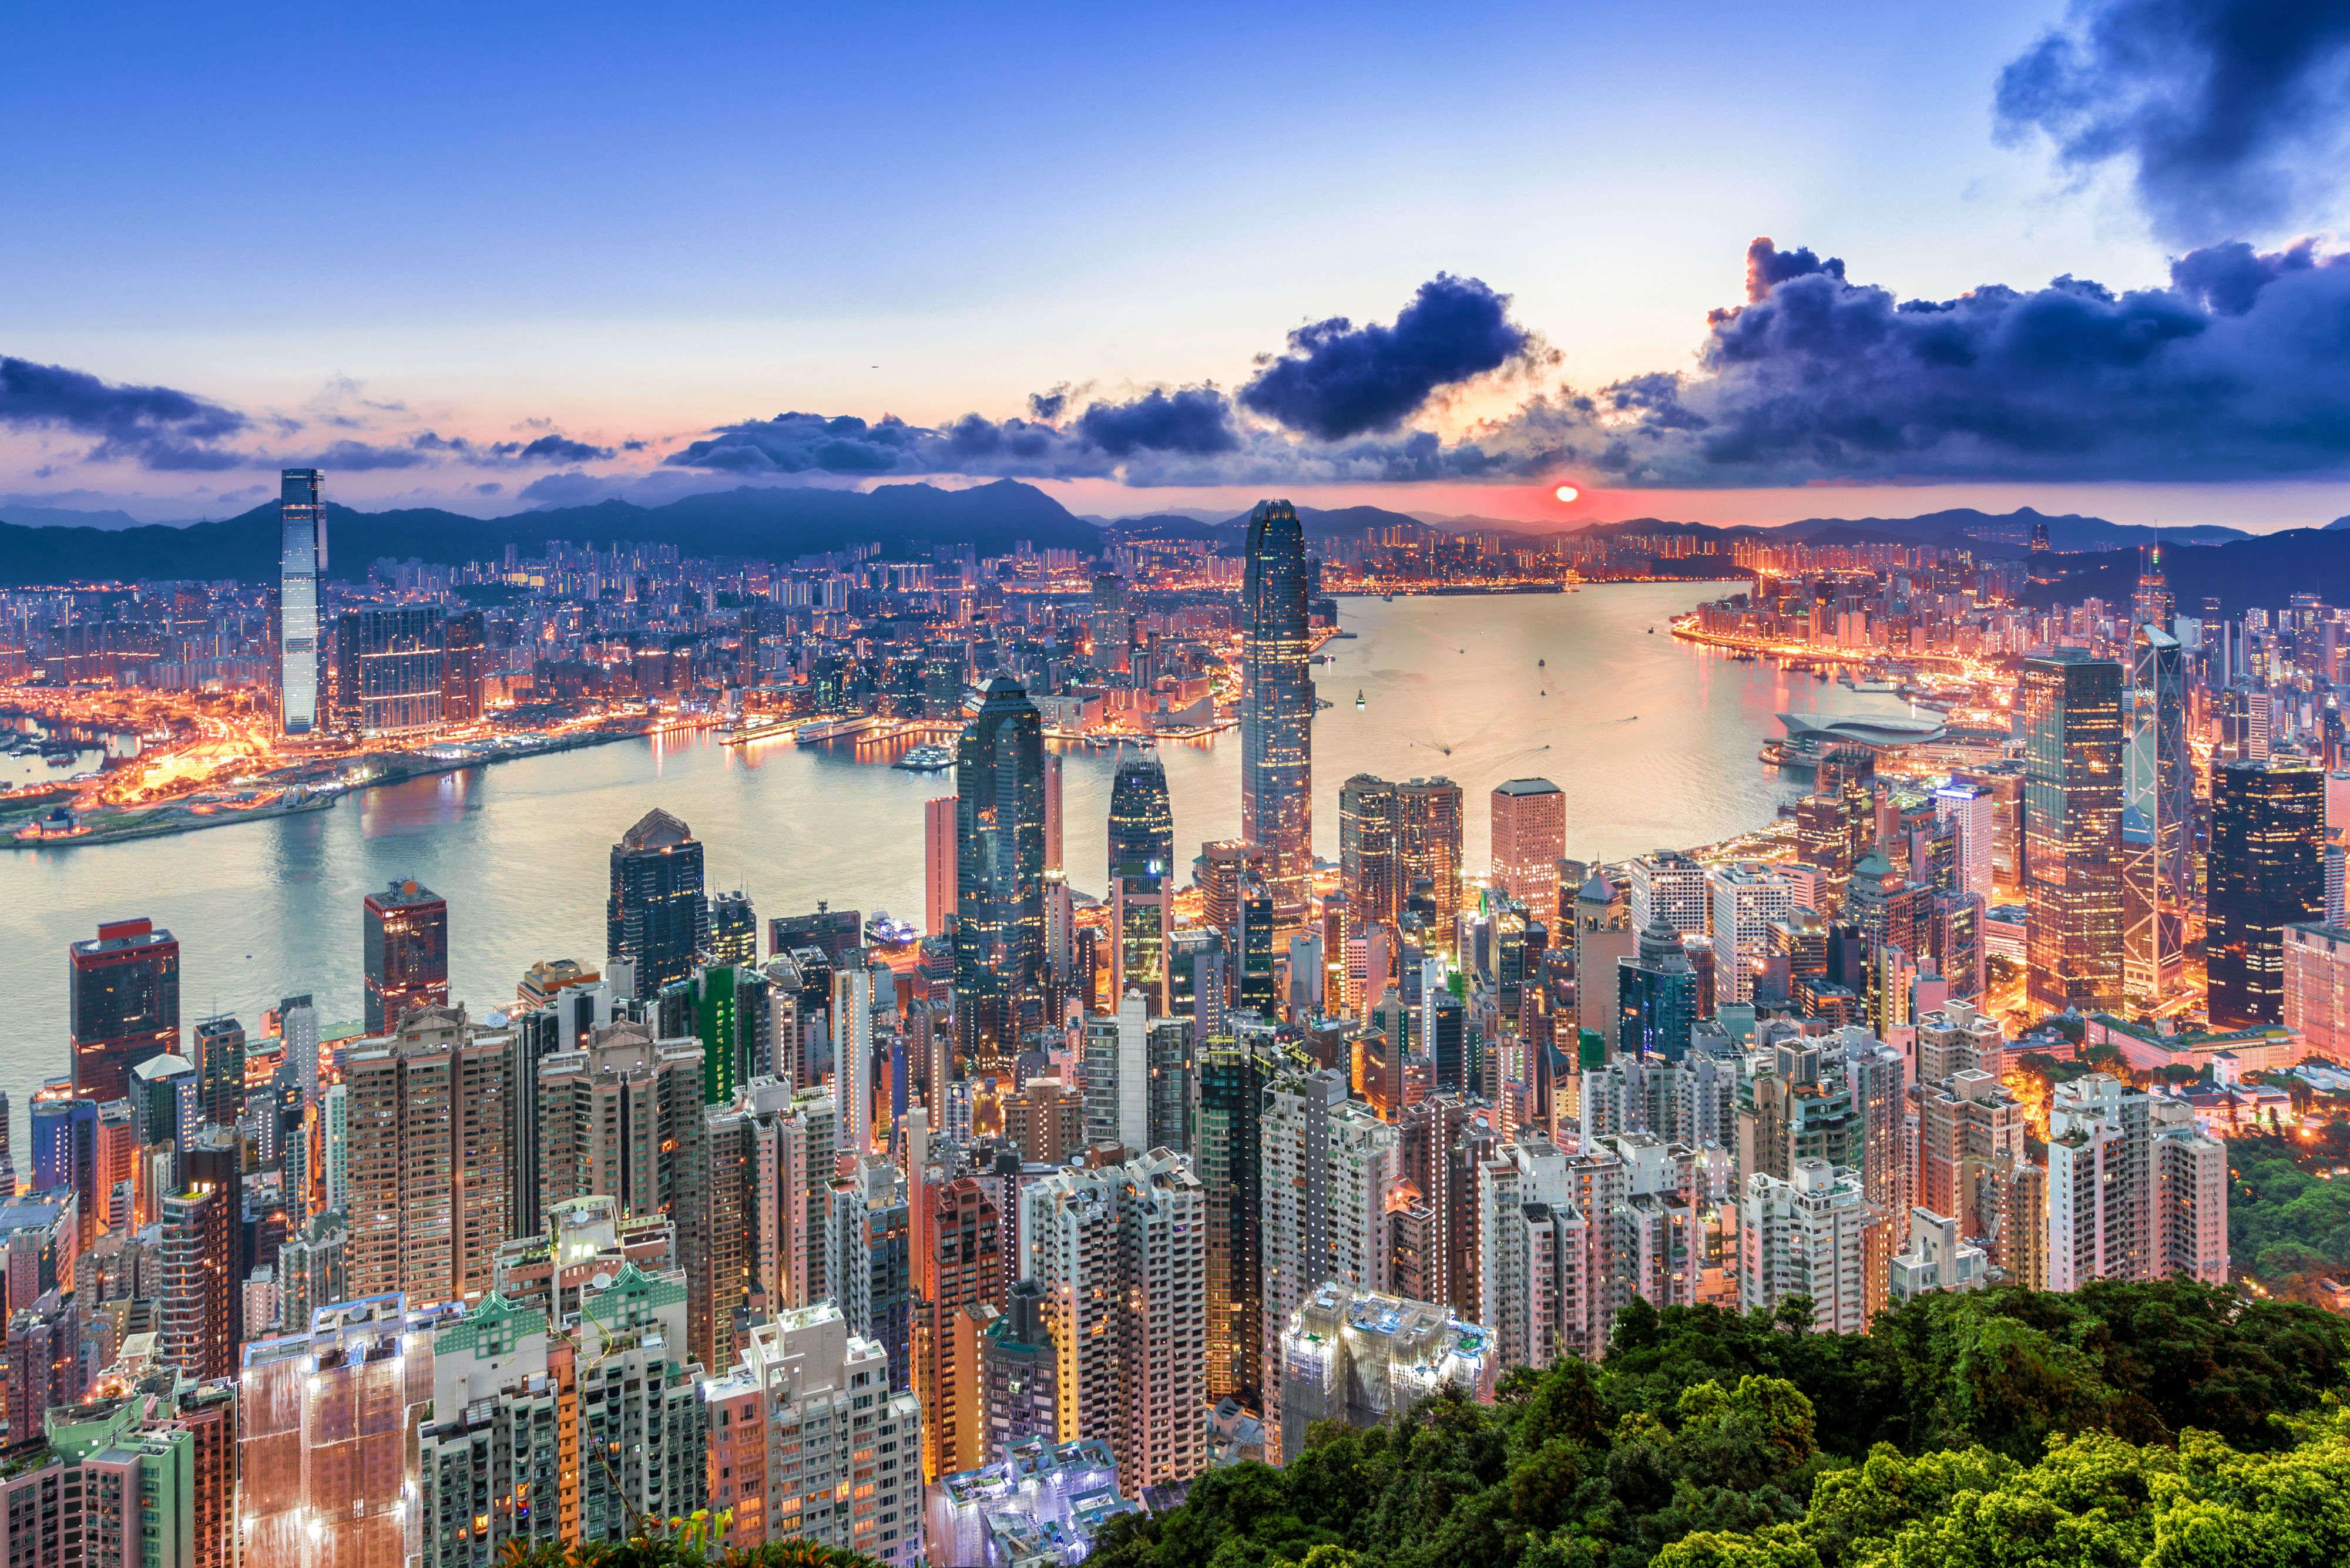 Discover the beautiful Hong Kong outdoors